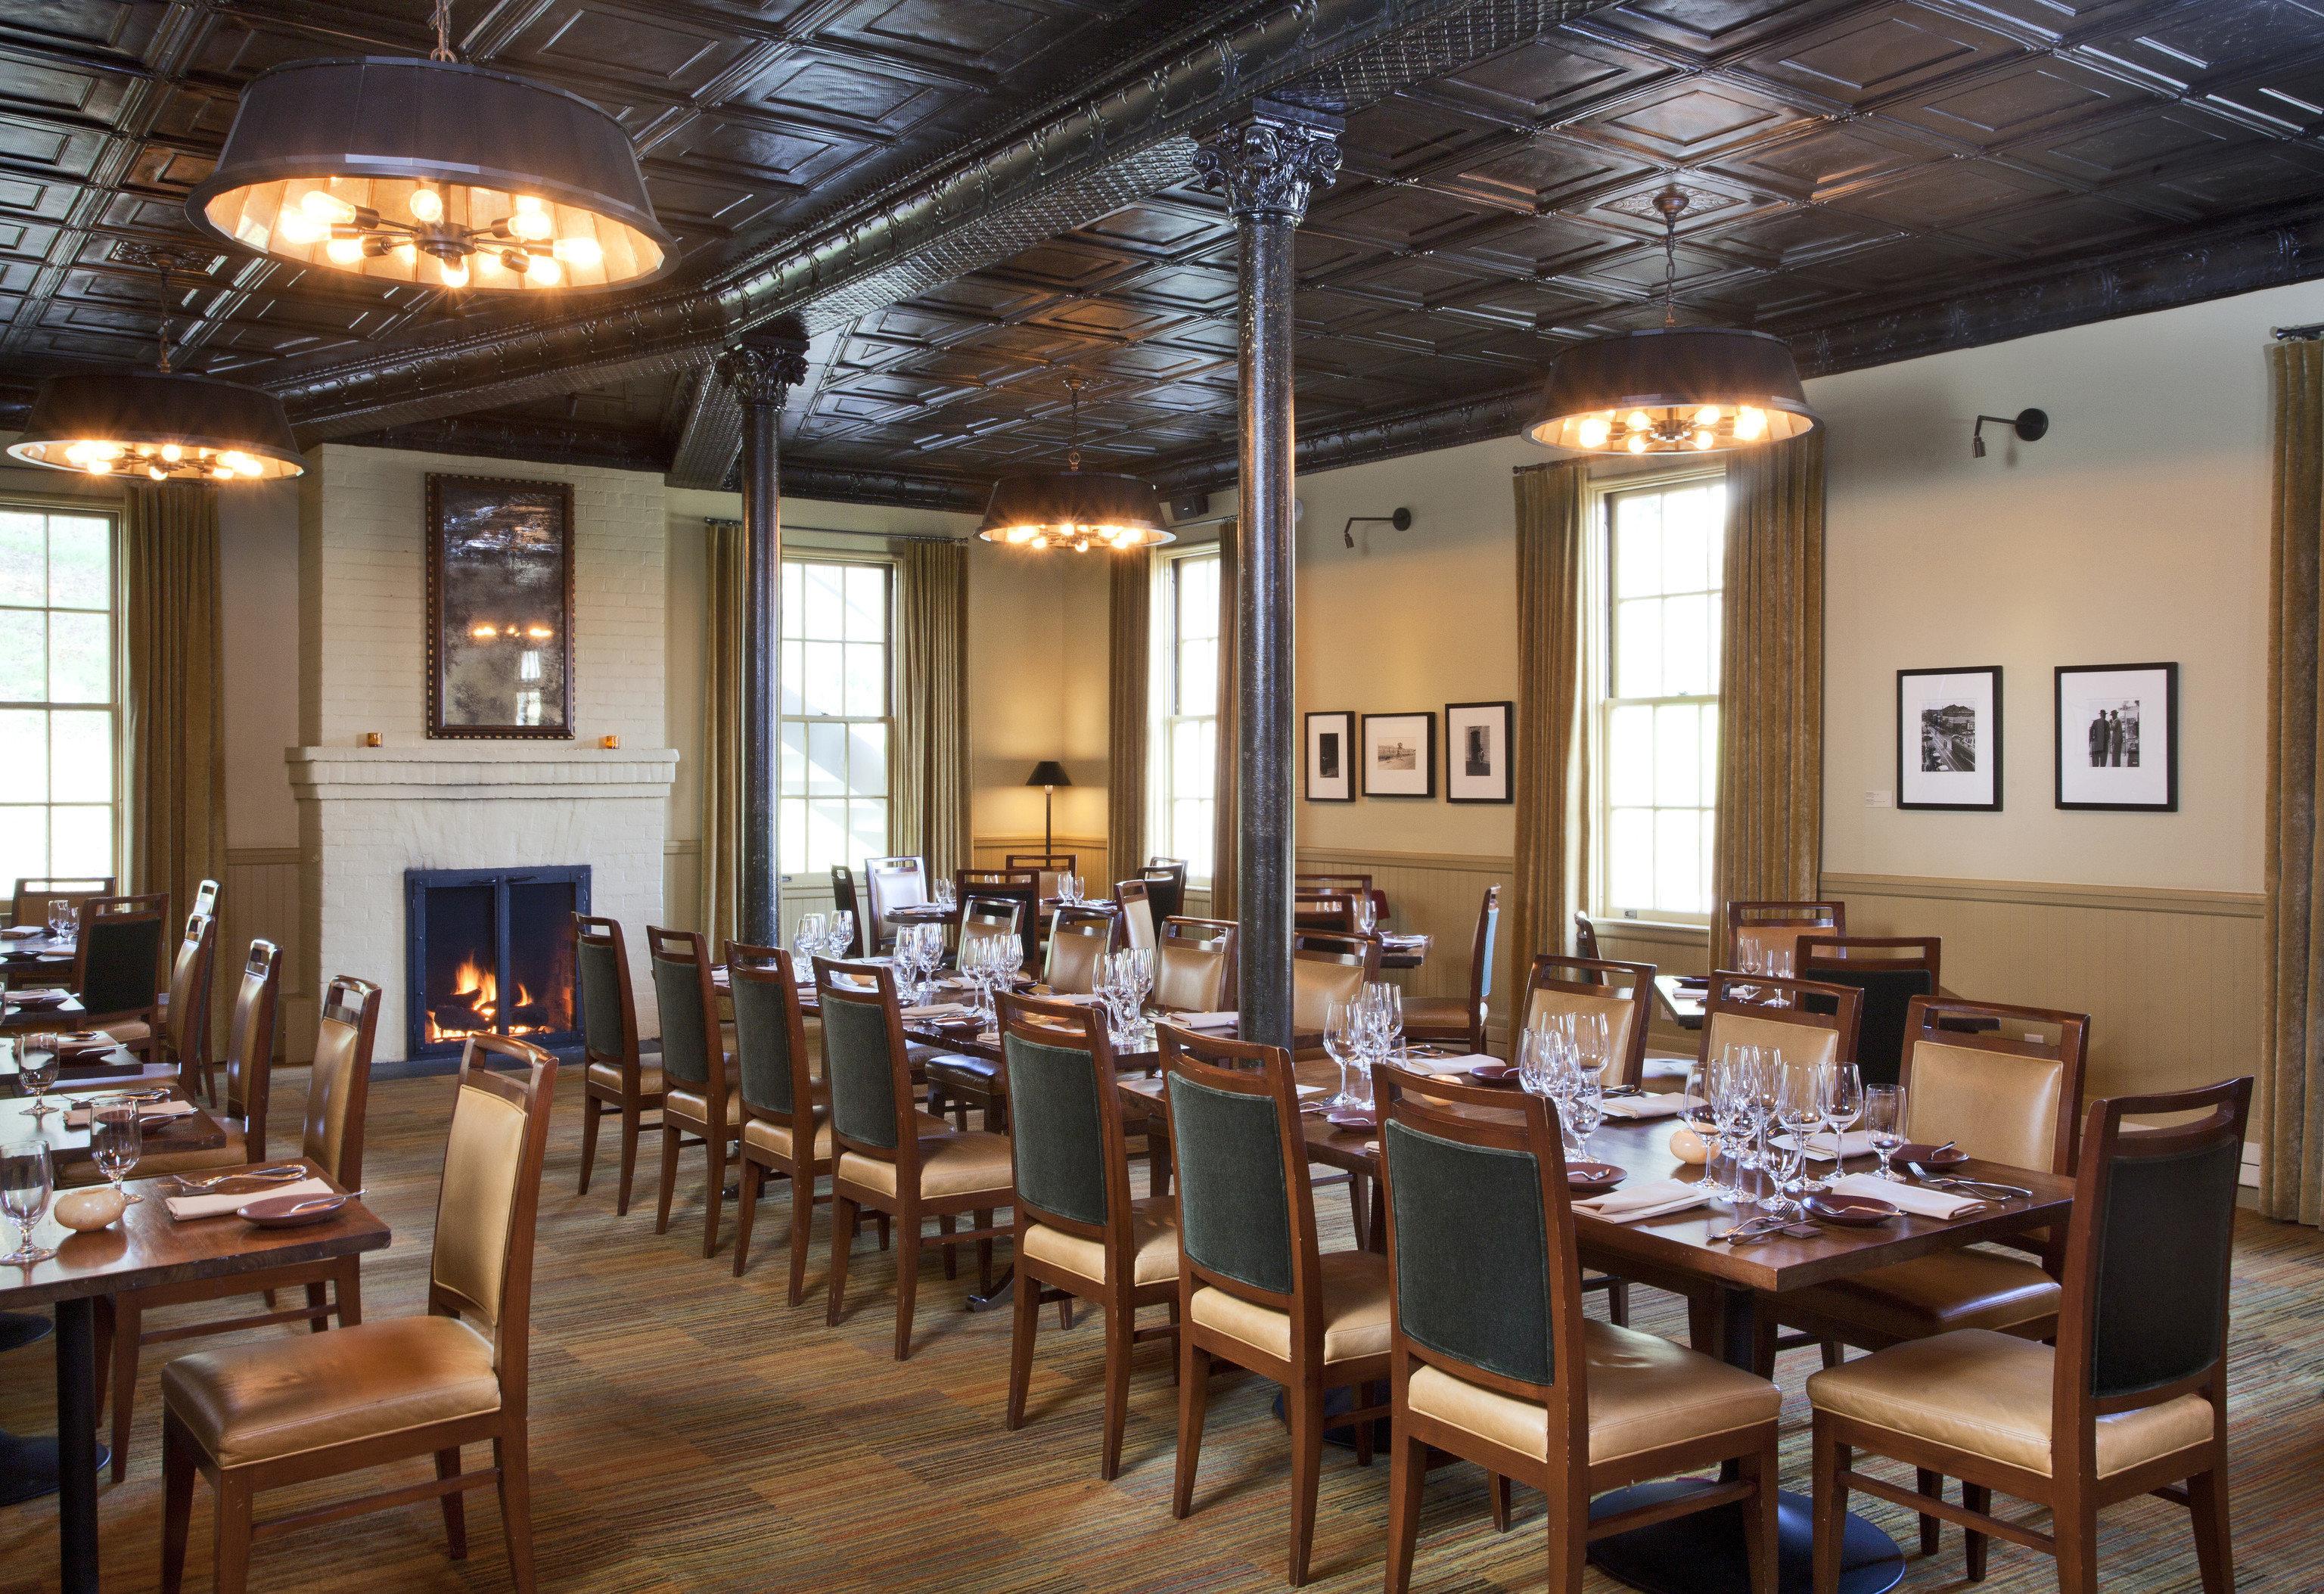 chair restaurant Dining function hall café Bar cafeteria set dining table